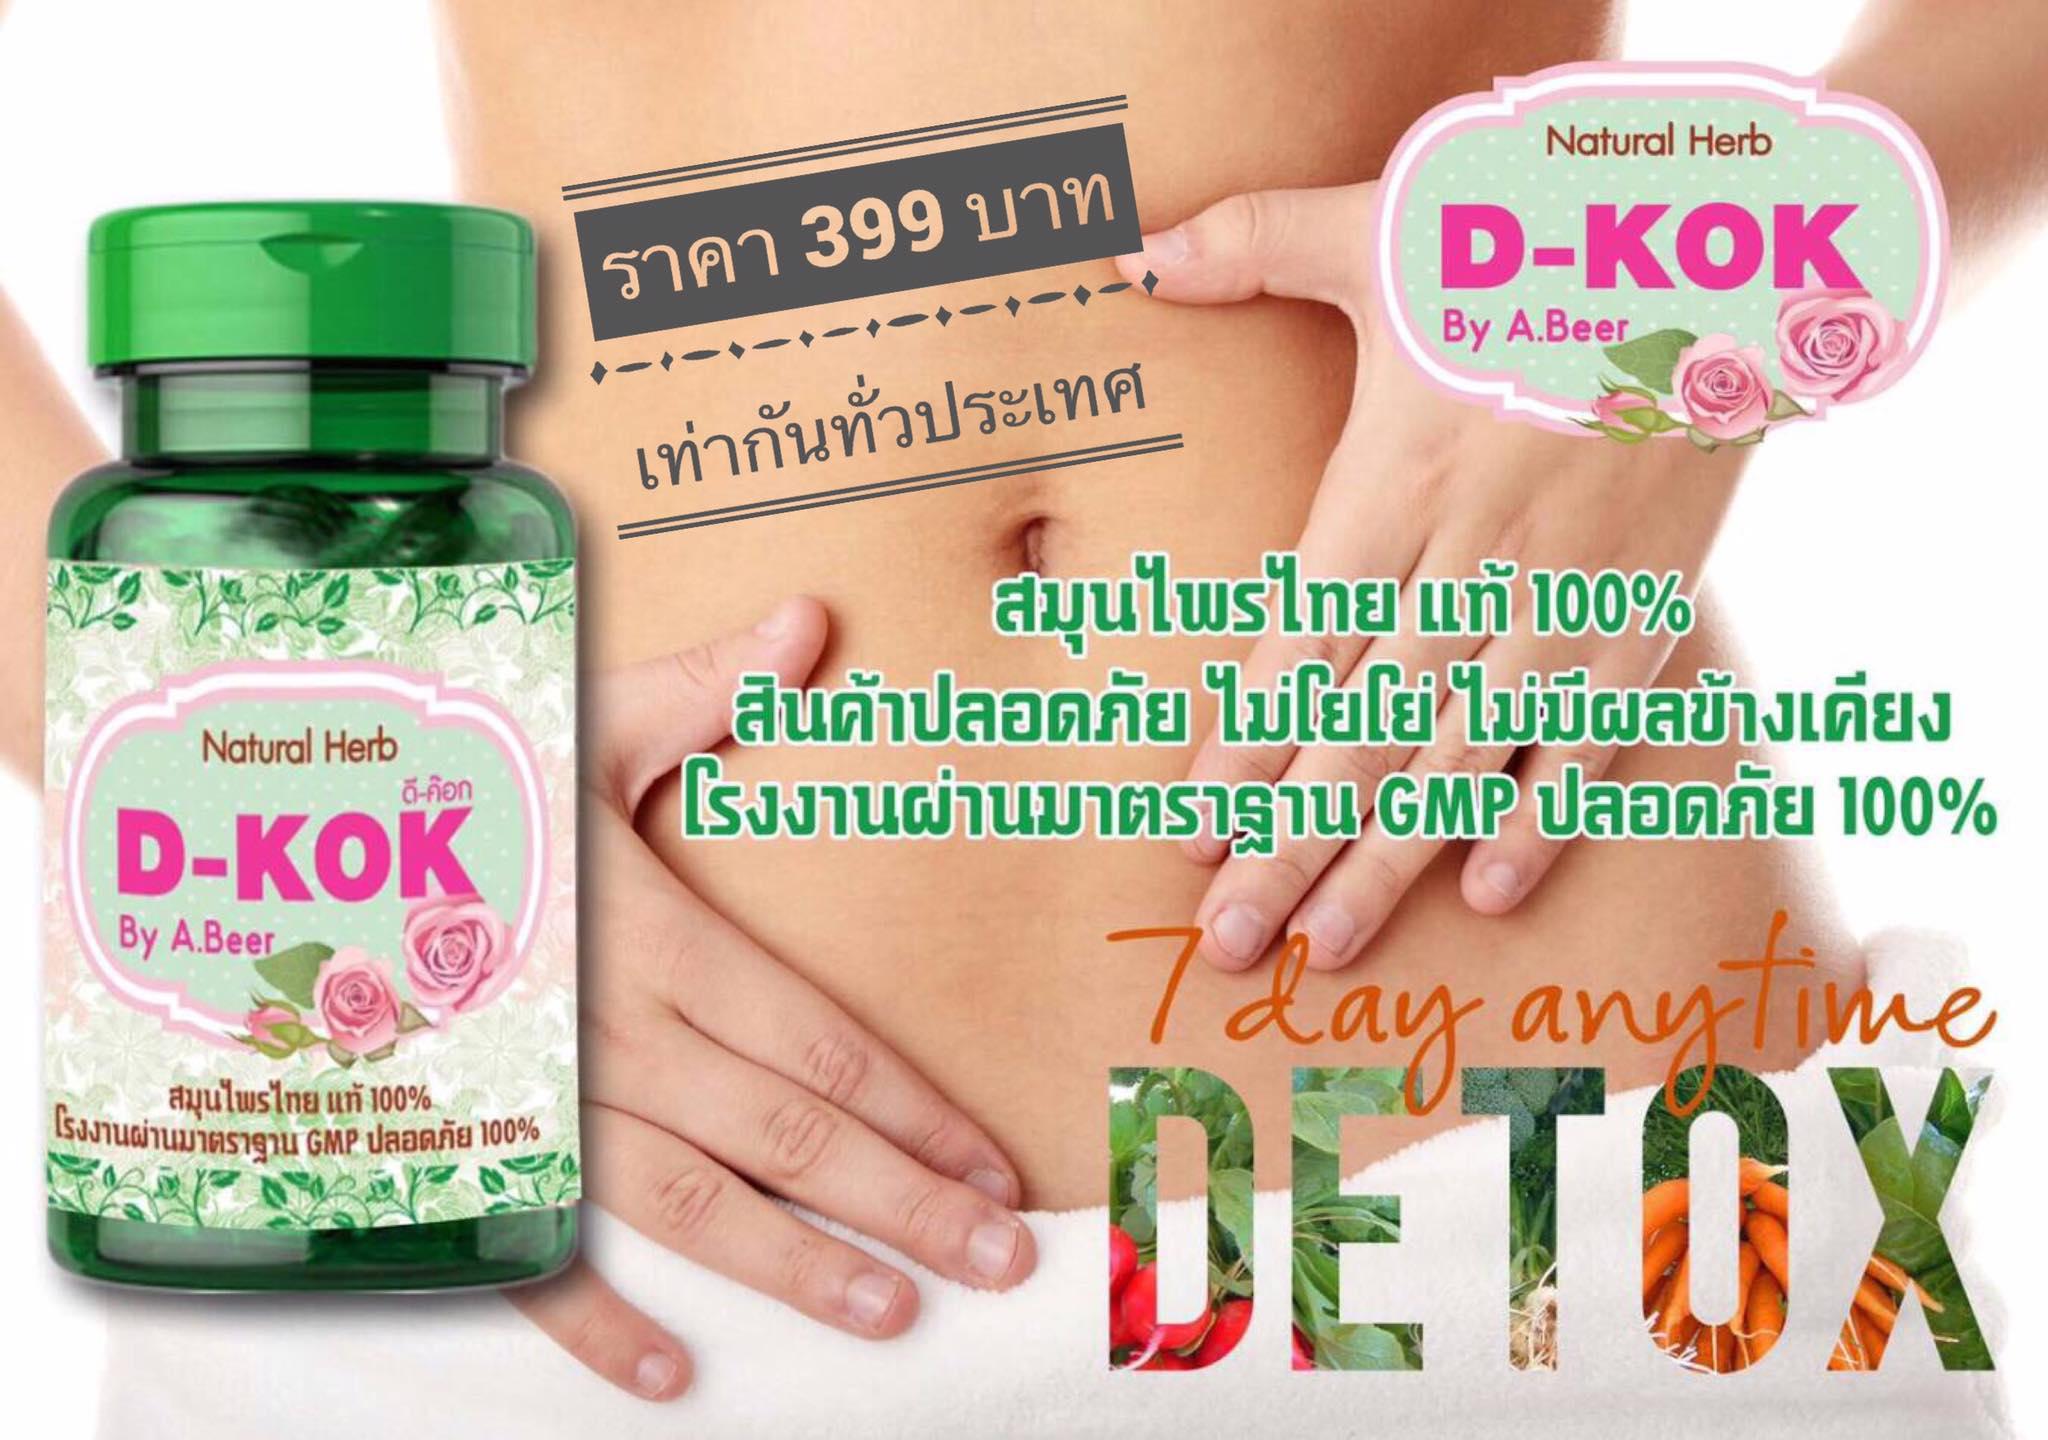 Natural Herb D-Kok by A. Bear เนเชอร์รัล เฮิร์บ ดีท๊อก สมุนไพรสบายพุง